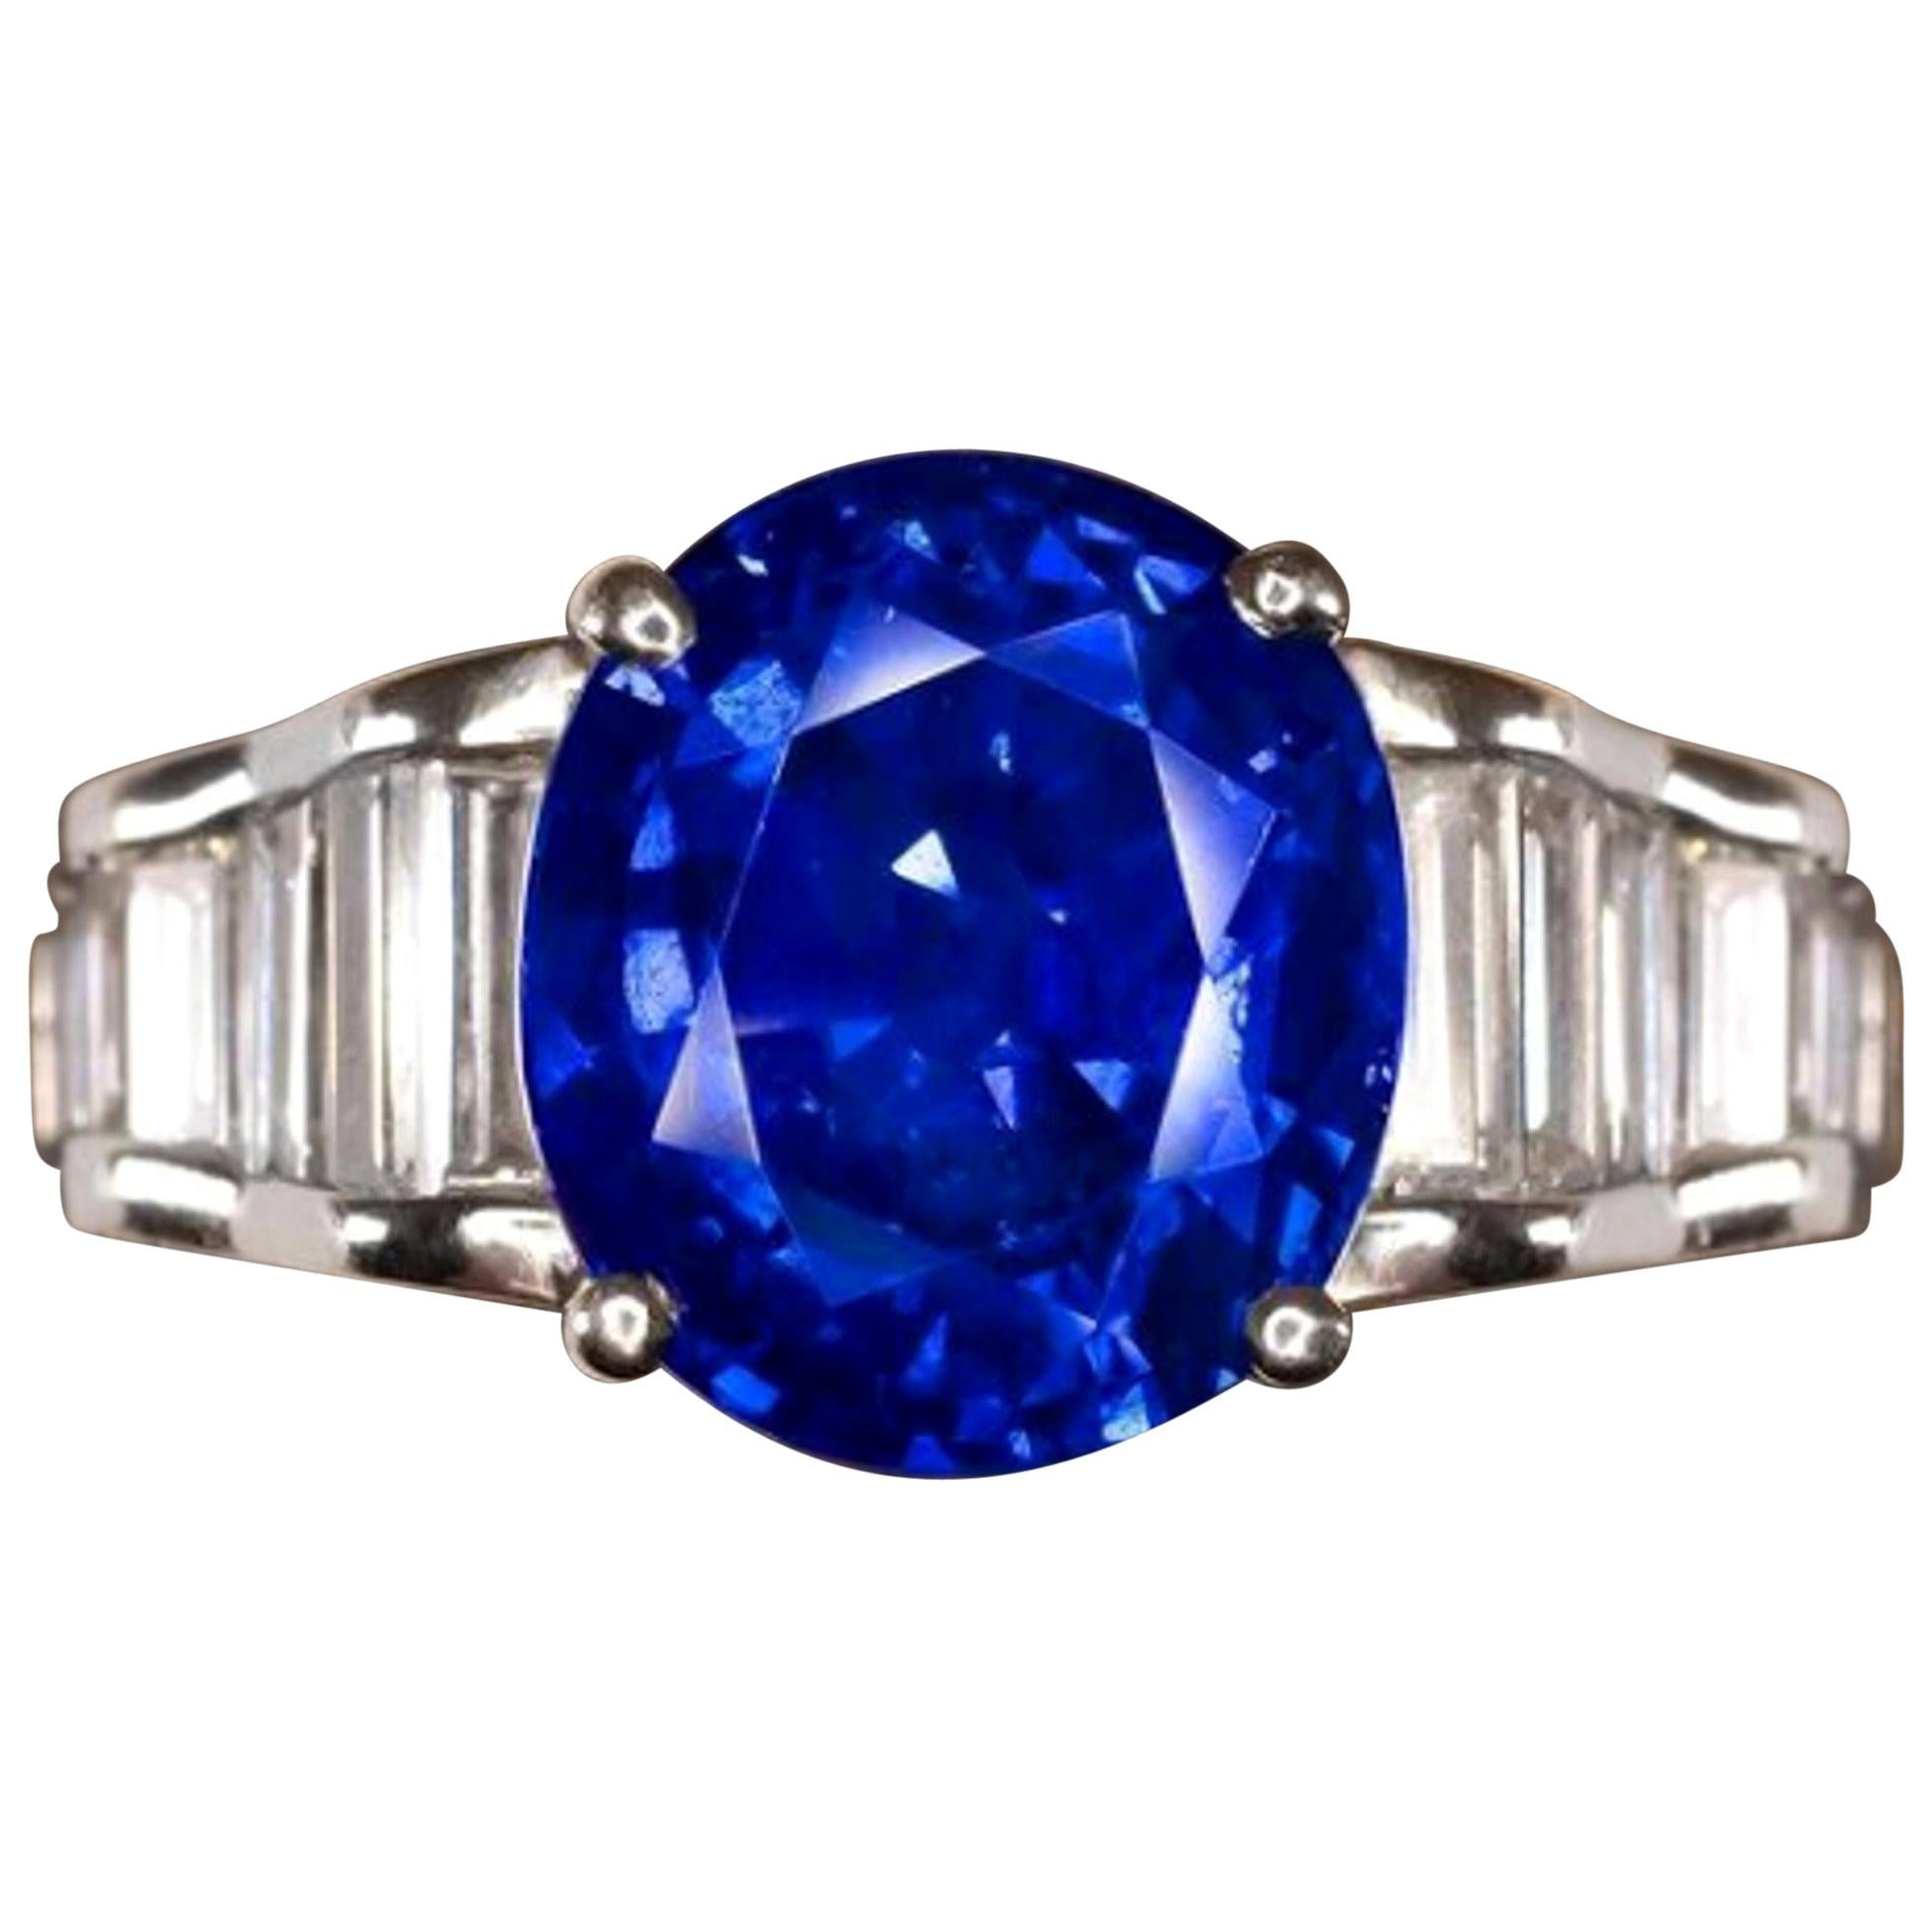 Vivid Blue Royal Blue GRS GIA Certified 5.30 Carat Blue Sapphire